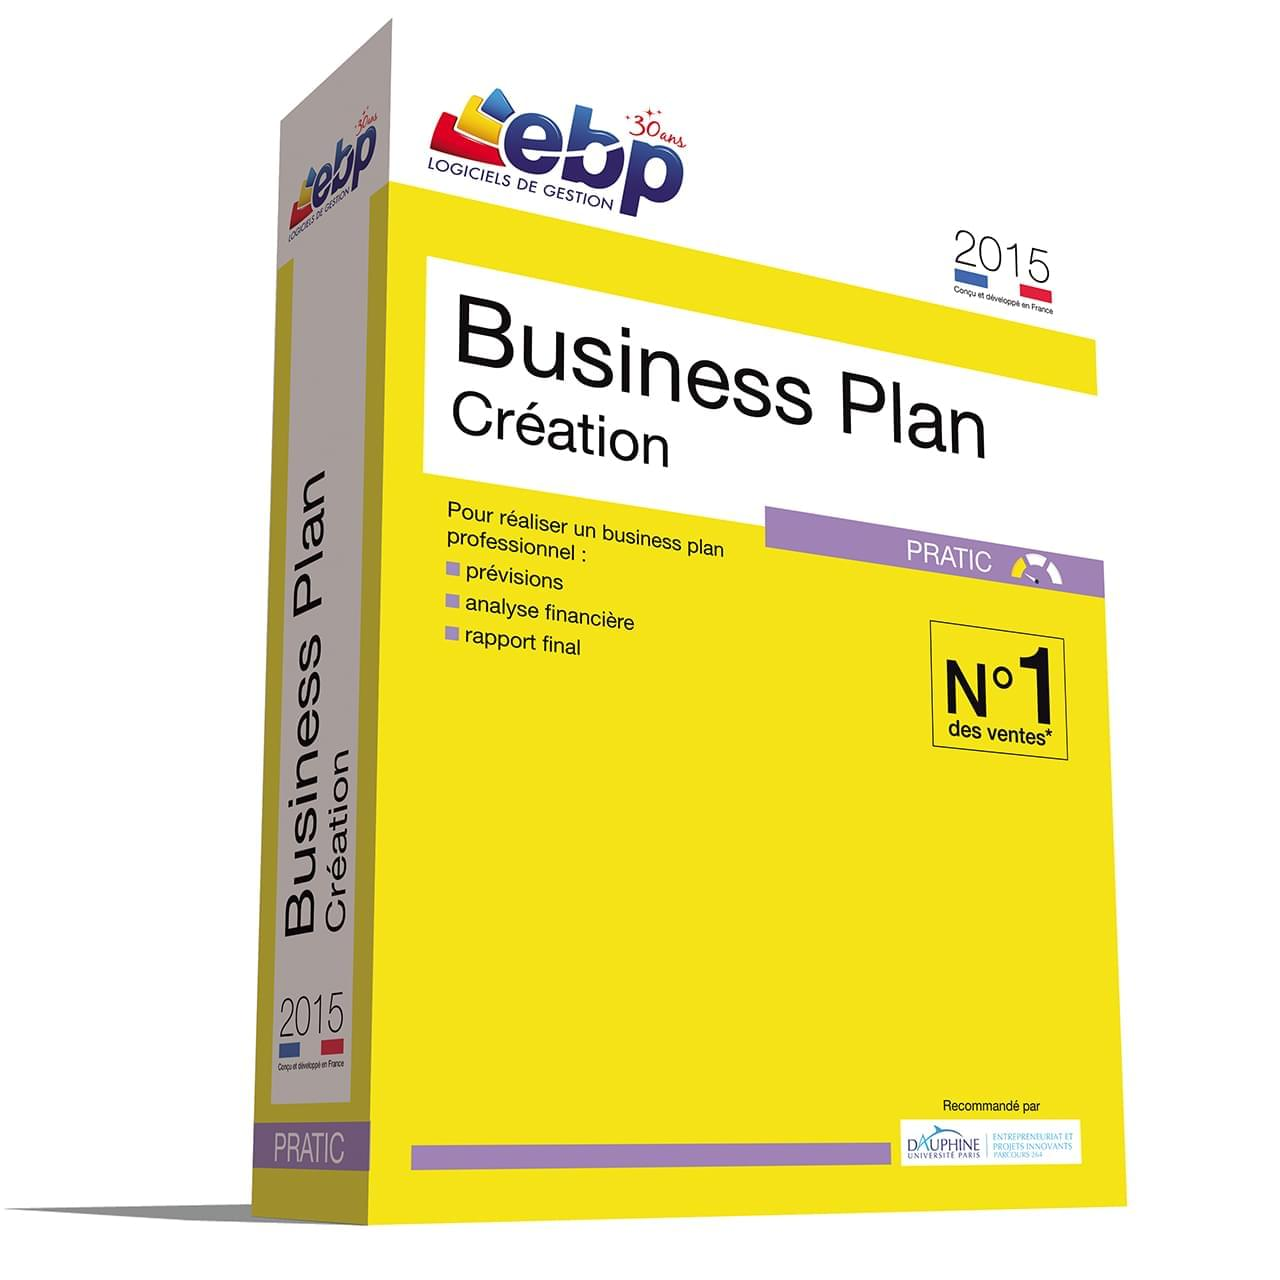 EBP Business Plan Pratic 2015 - Logiciel application - Cybertek.fr - 0